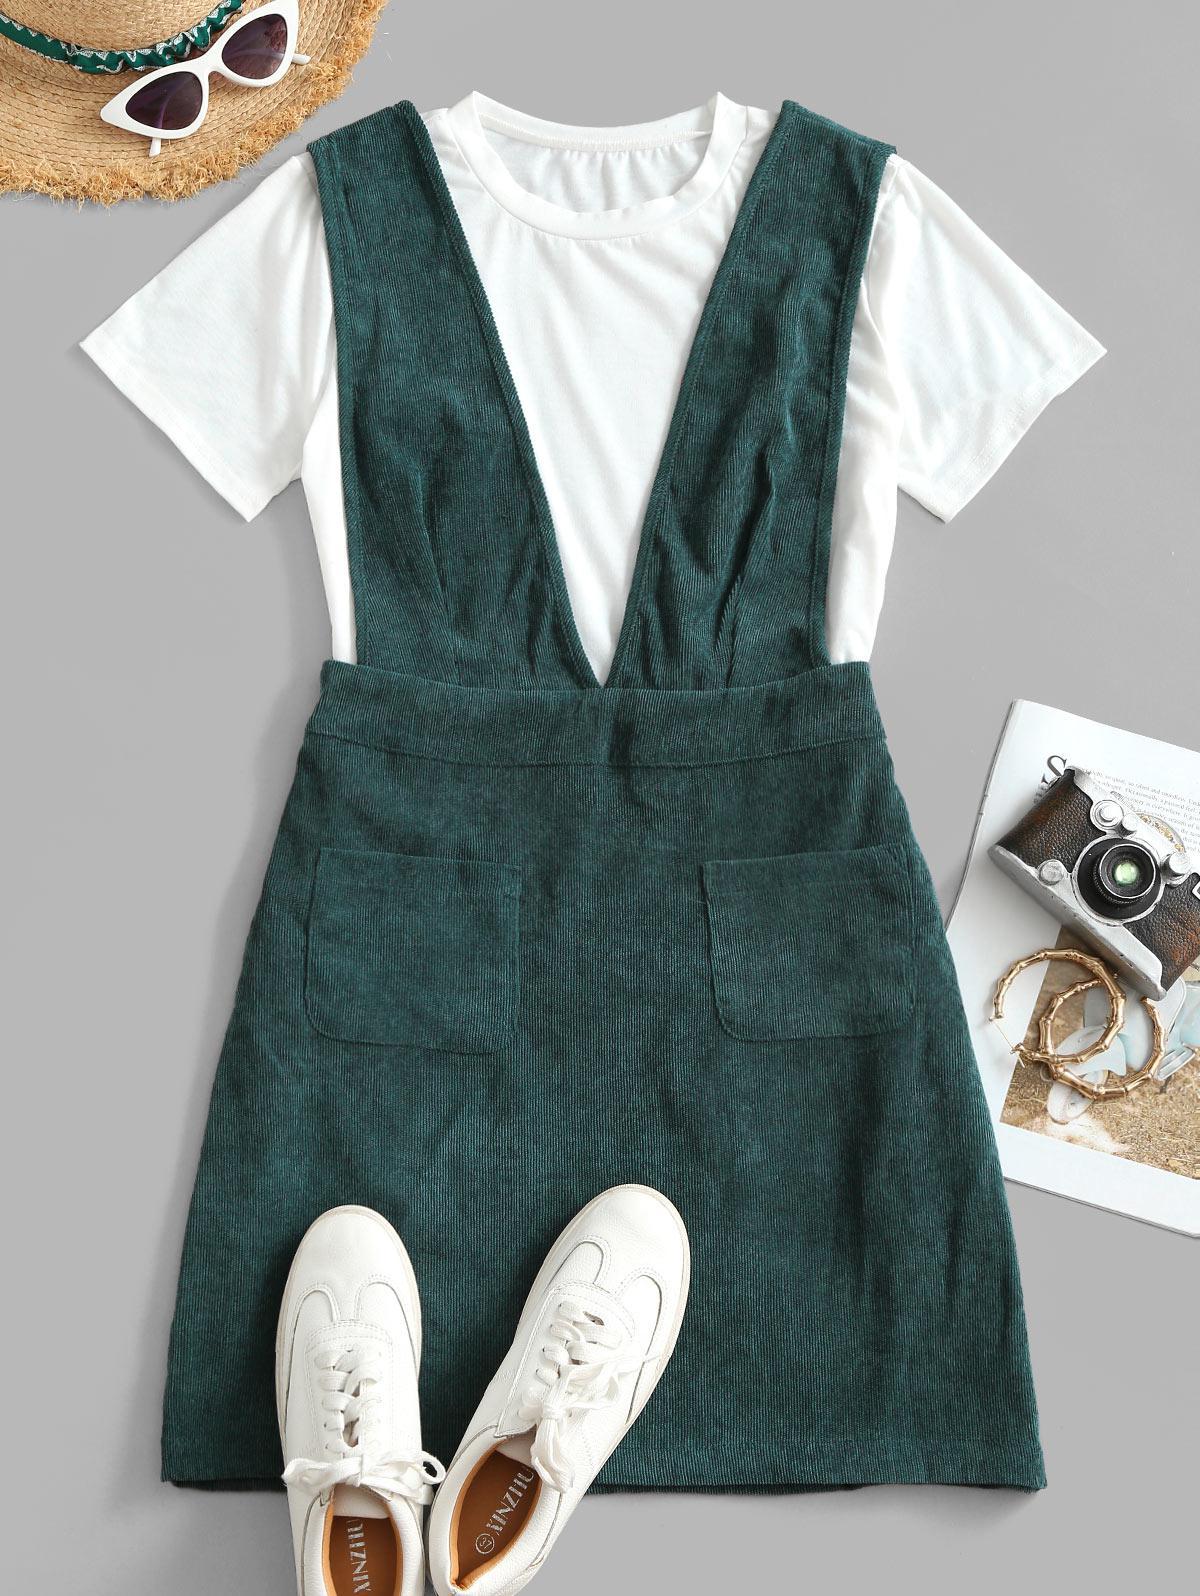 Dual Pocket Corduroy Casual Overalls Dress